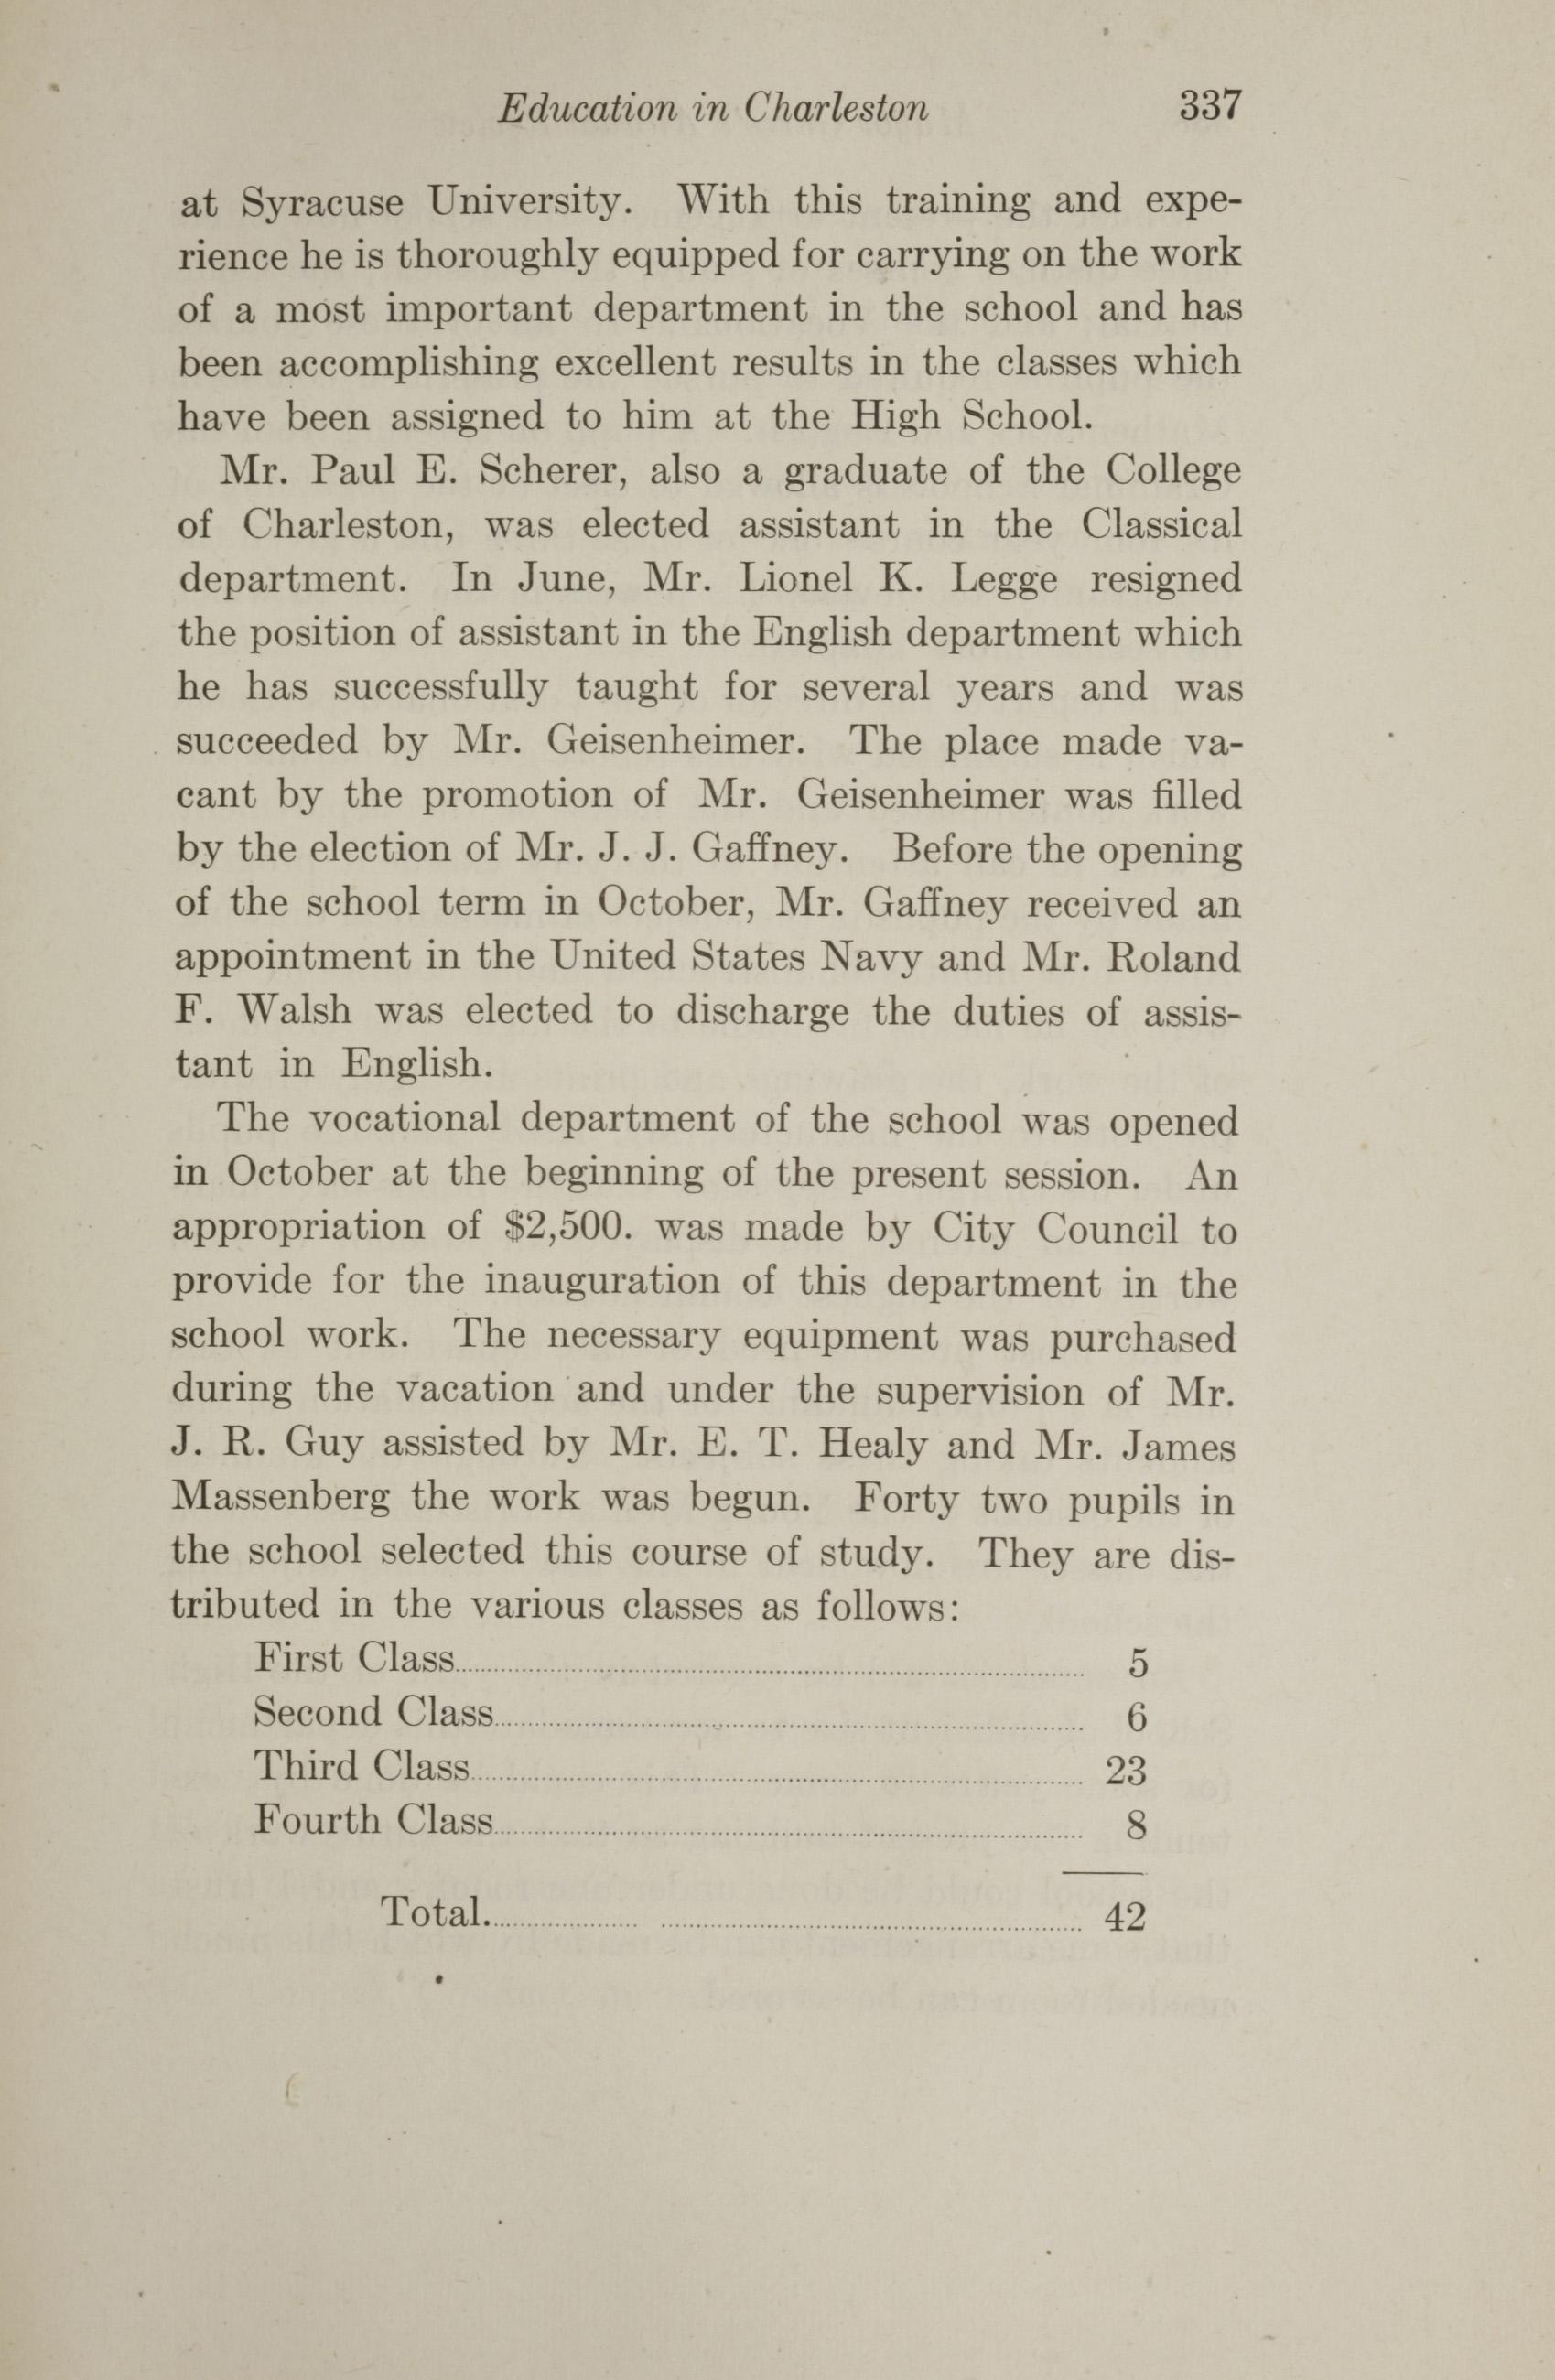 Charleston Yearbook, 1912, page 337